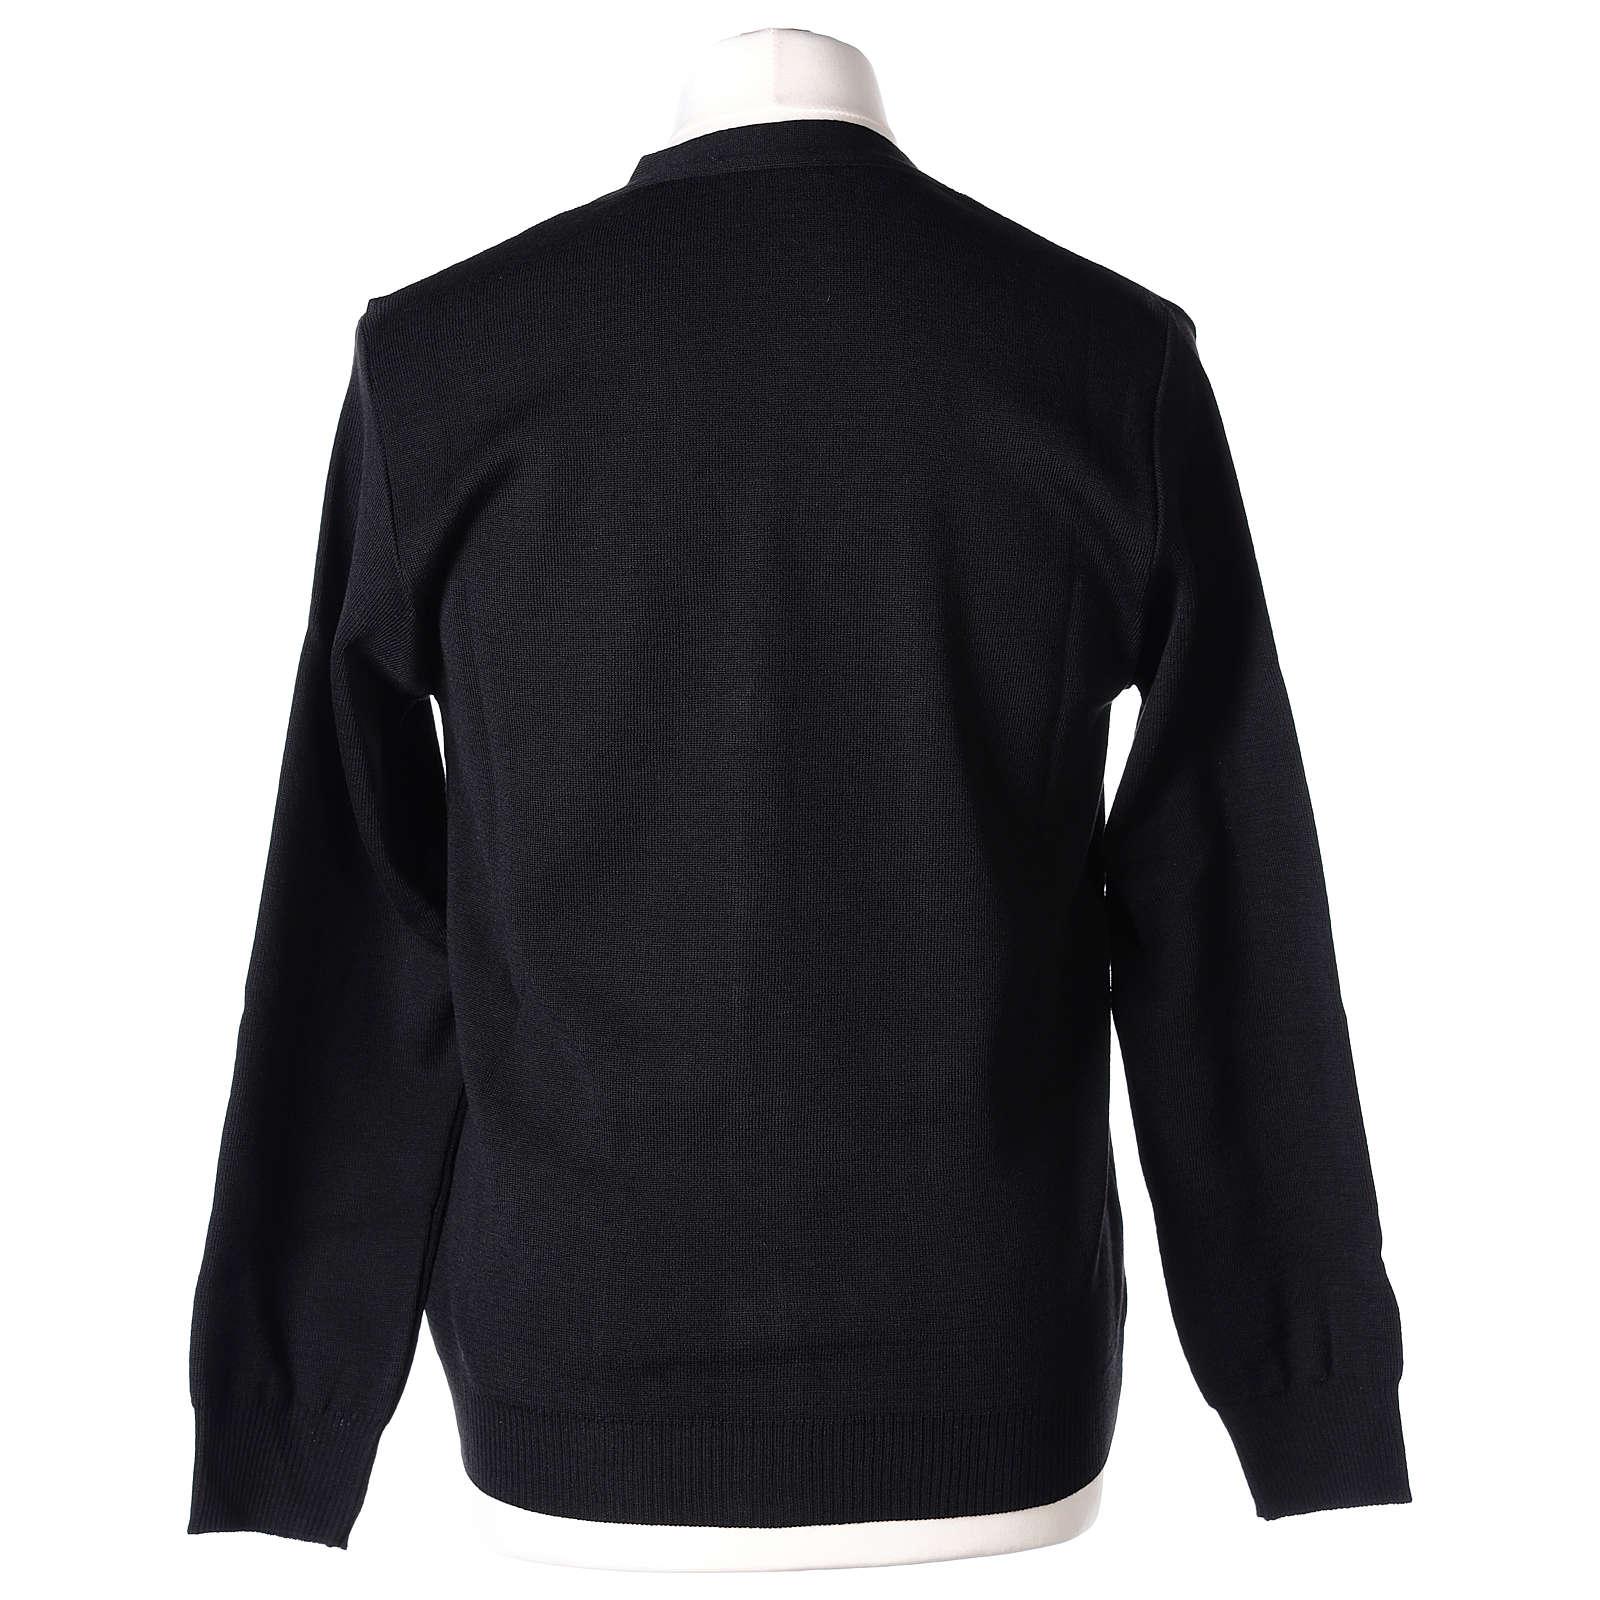 Giacca sacerdote nera tasche e bottoni 50% lana merino 50% acrilico In Primis 4